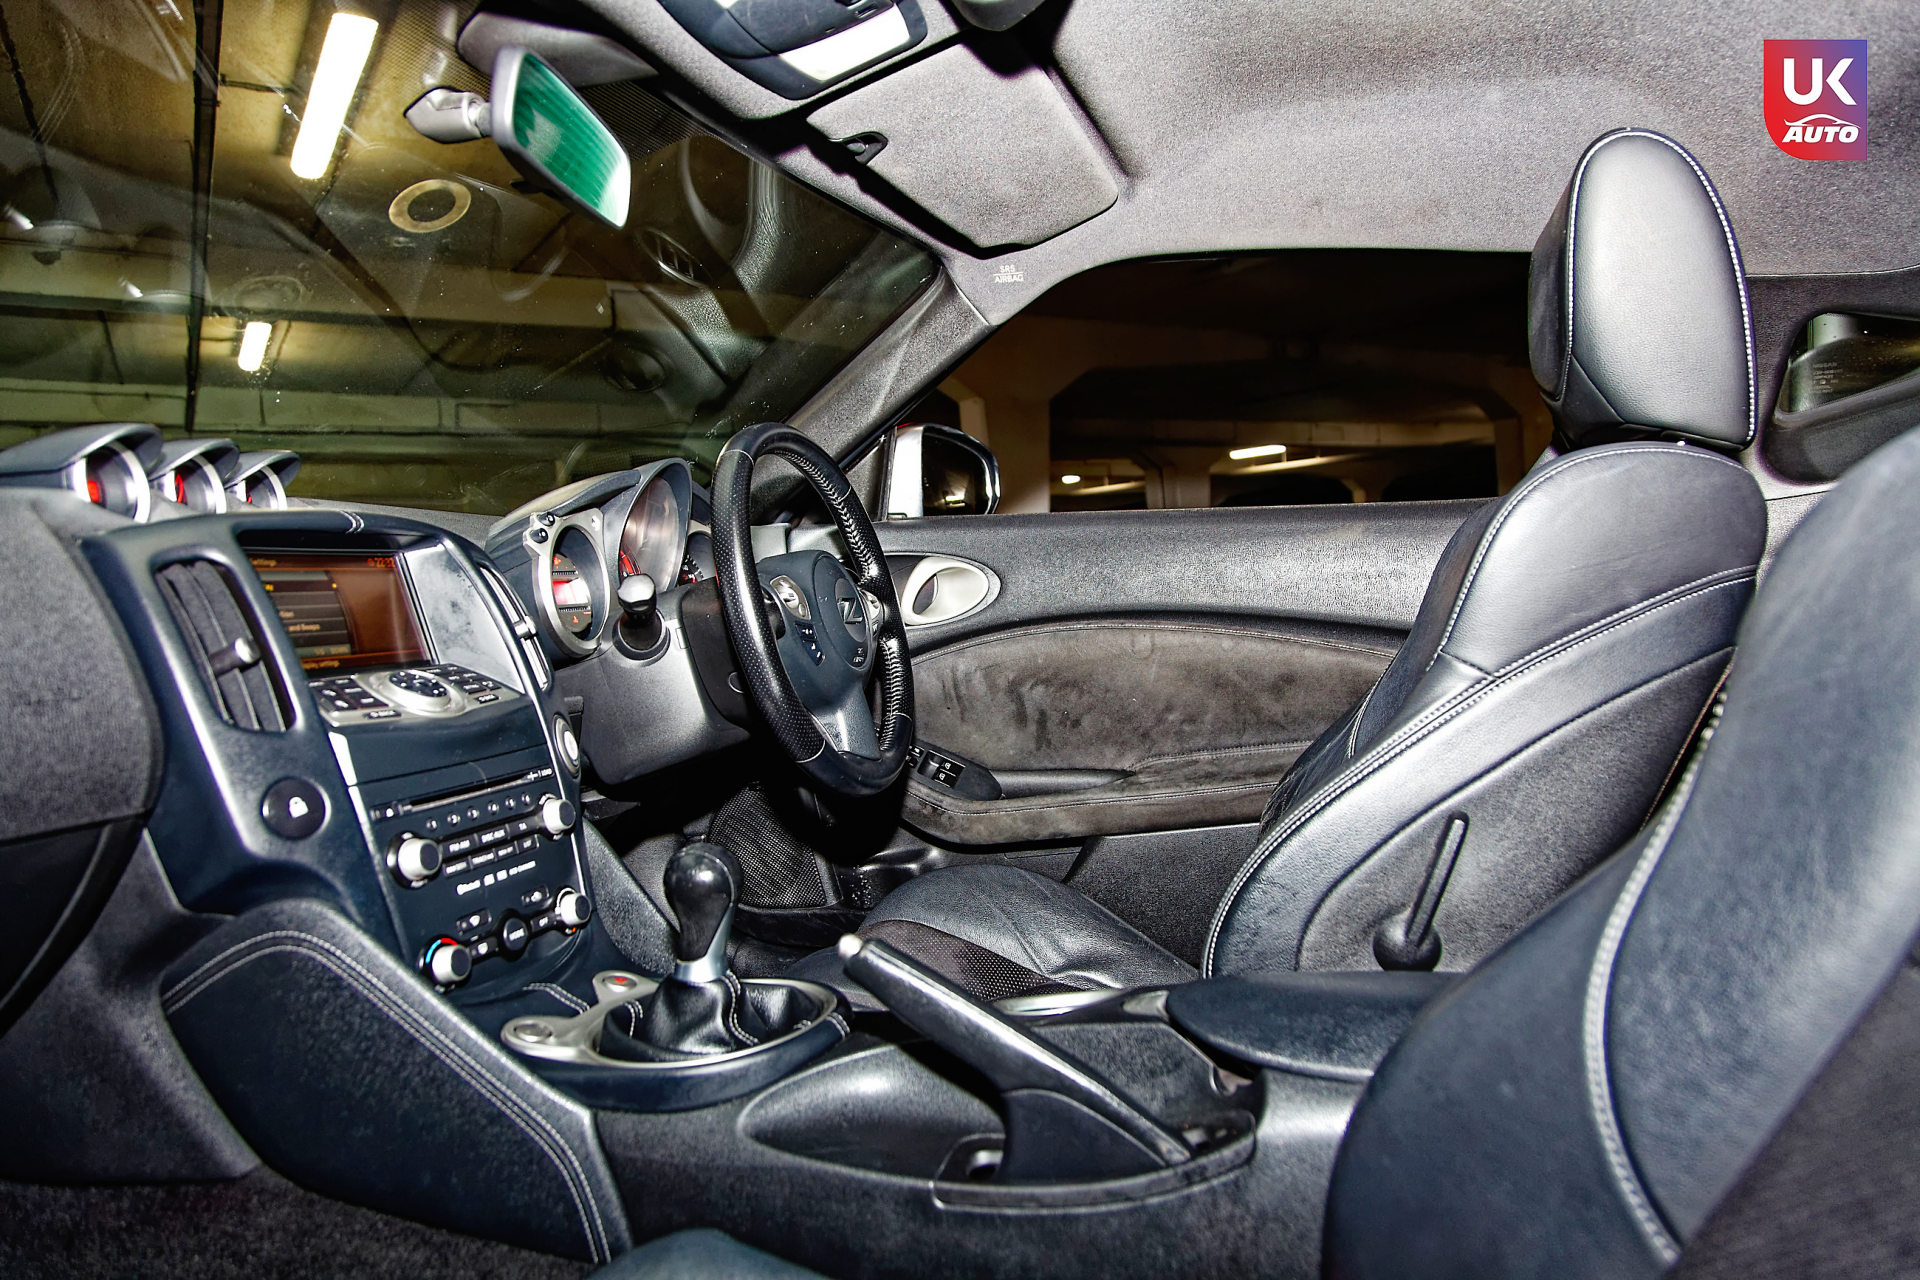 Nissan 370Z SUPERCHARGED UK IMPORTATION VOITURE ANGLAISE NISSAN ANGLETERRE NISSAN UK UKAUTO11 DxO - IMPORTATION NISSAN ANGLETERRE NISSAN 370Z V6 RHD VOITURE ANGLAISE SPORTIVE